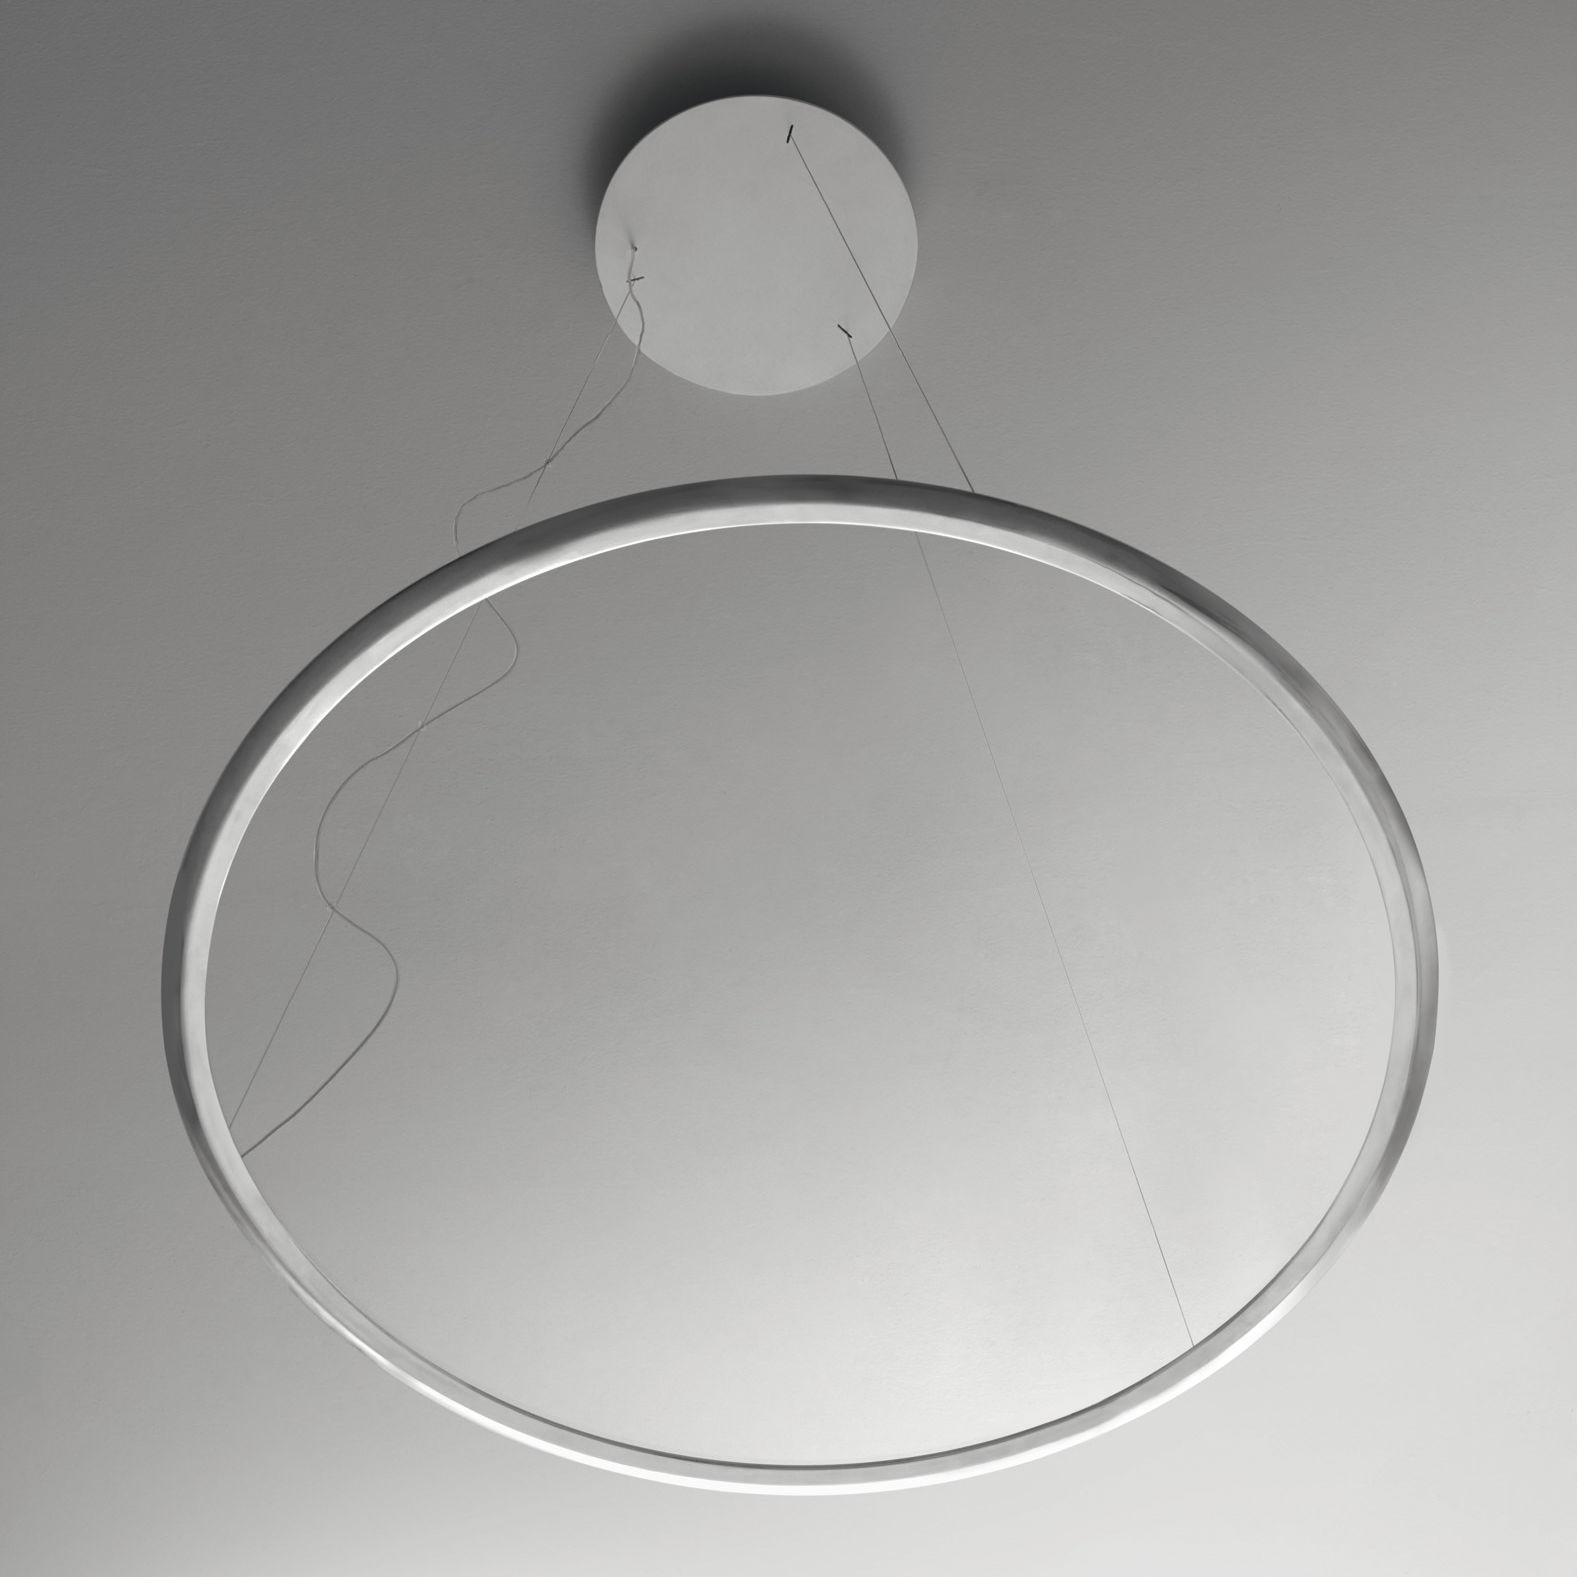 Lighting - Pendant Lighting - Discovery LED Pendant - Ø 70 cm by Artemide - Transparent disc / aluminium frame - Aluminium, PMMA